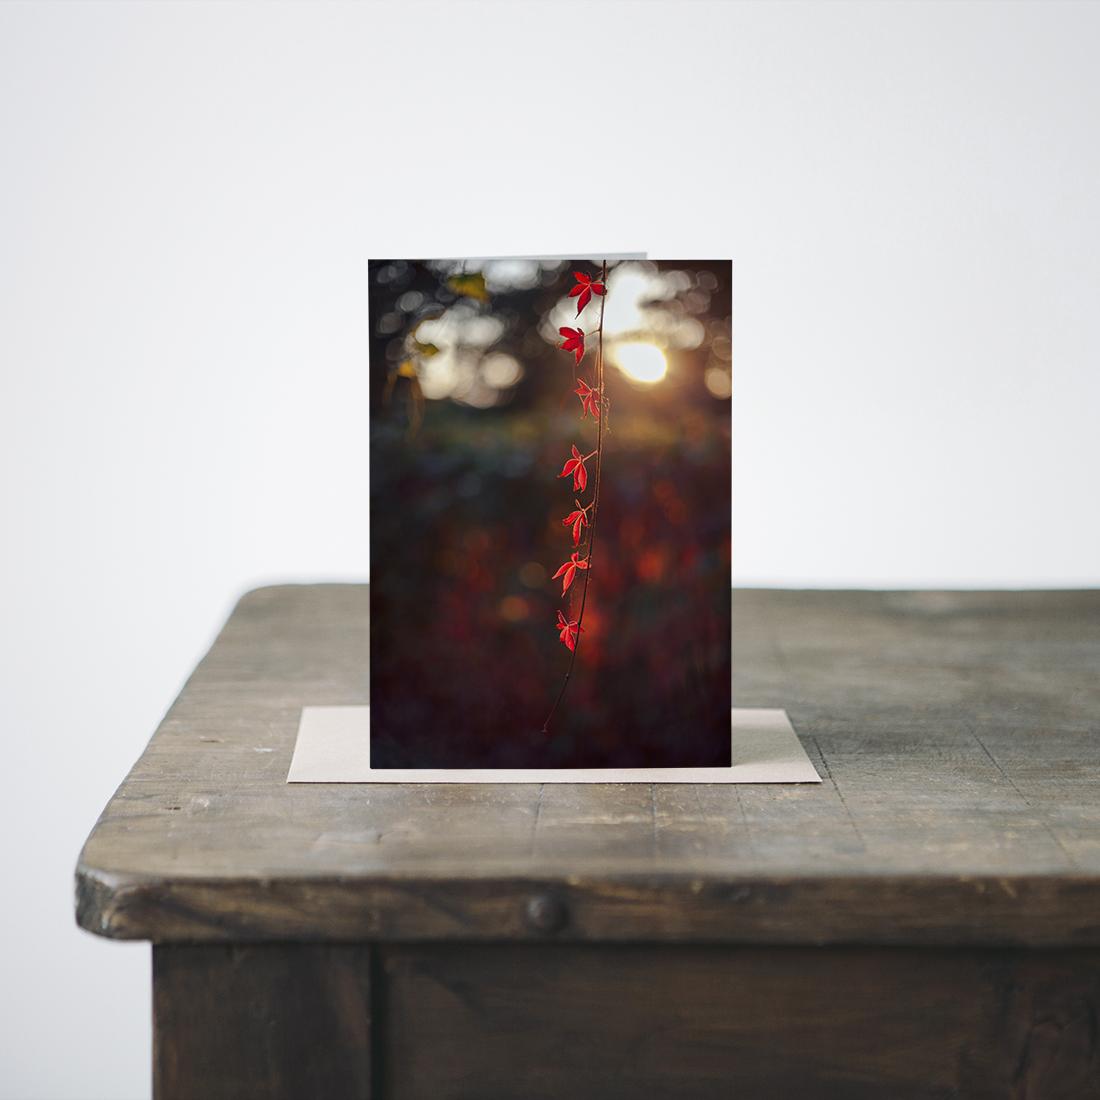 karolina-koziel-photography-products-greetings-cards.jpg